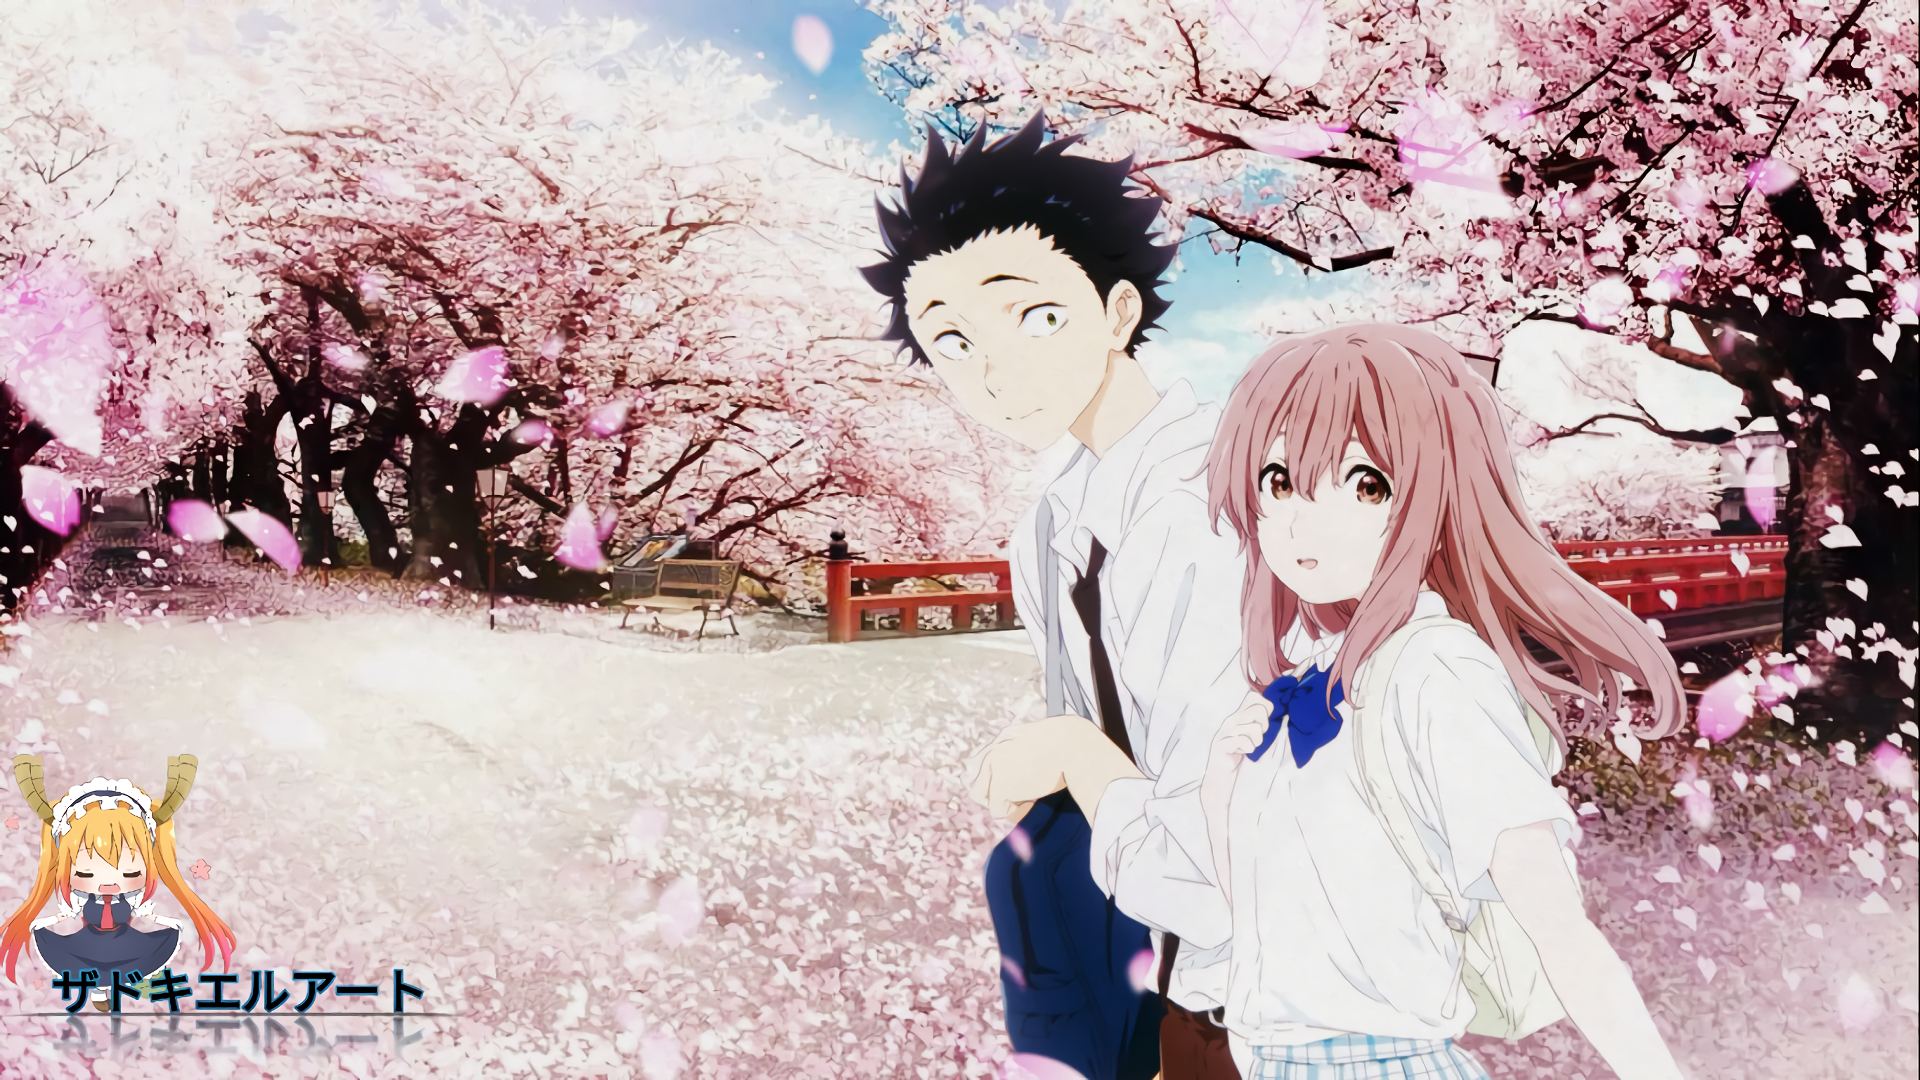 Image Result For Download Wallpaper Anime Koe No Katachi Hd